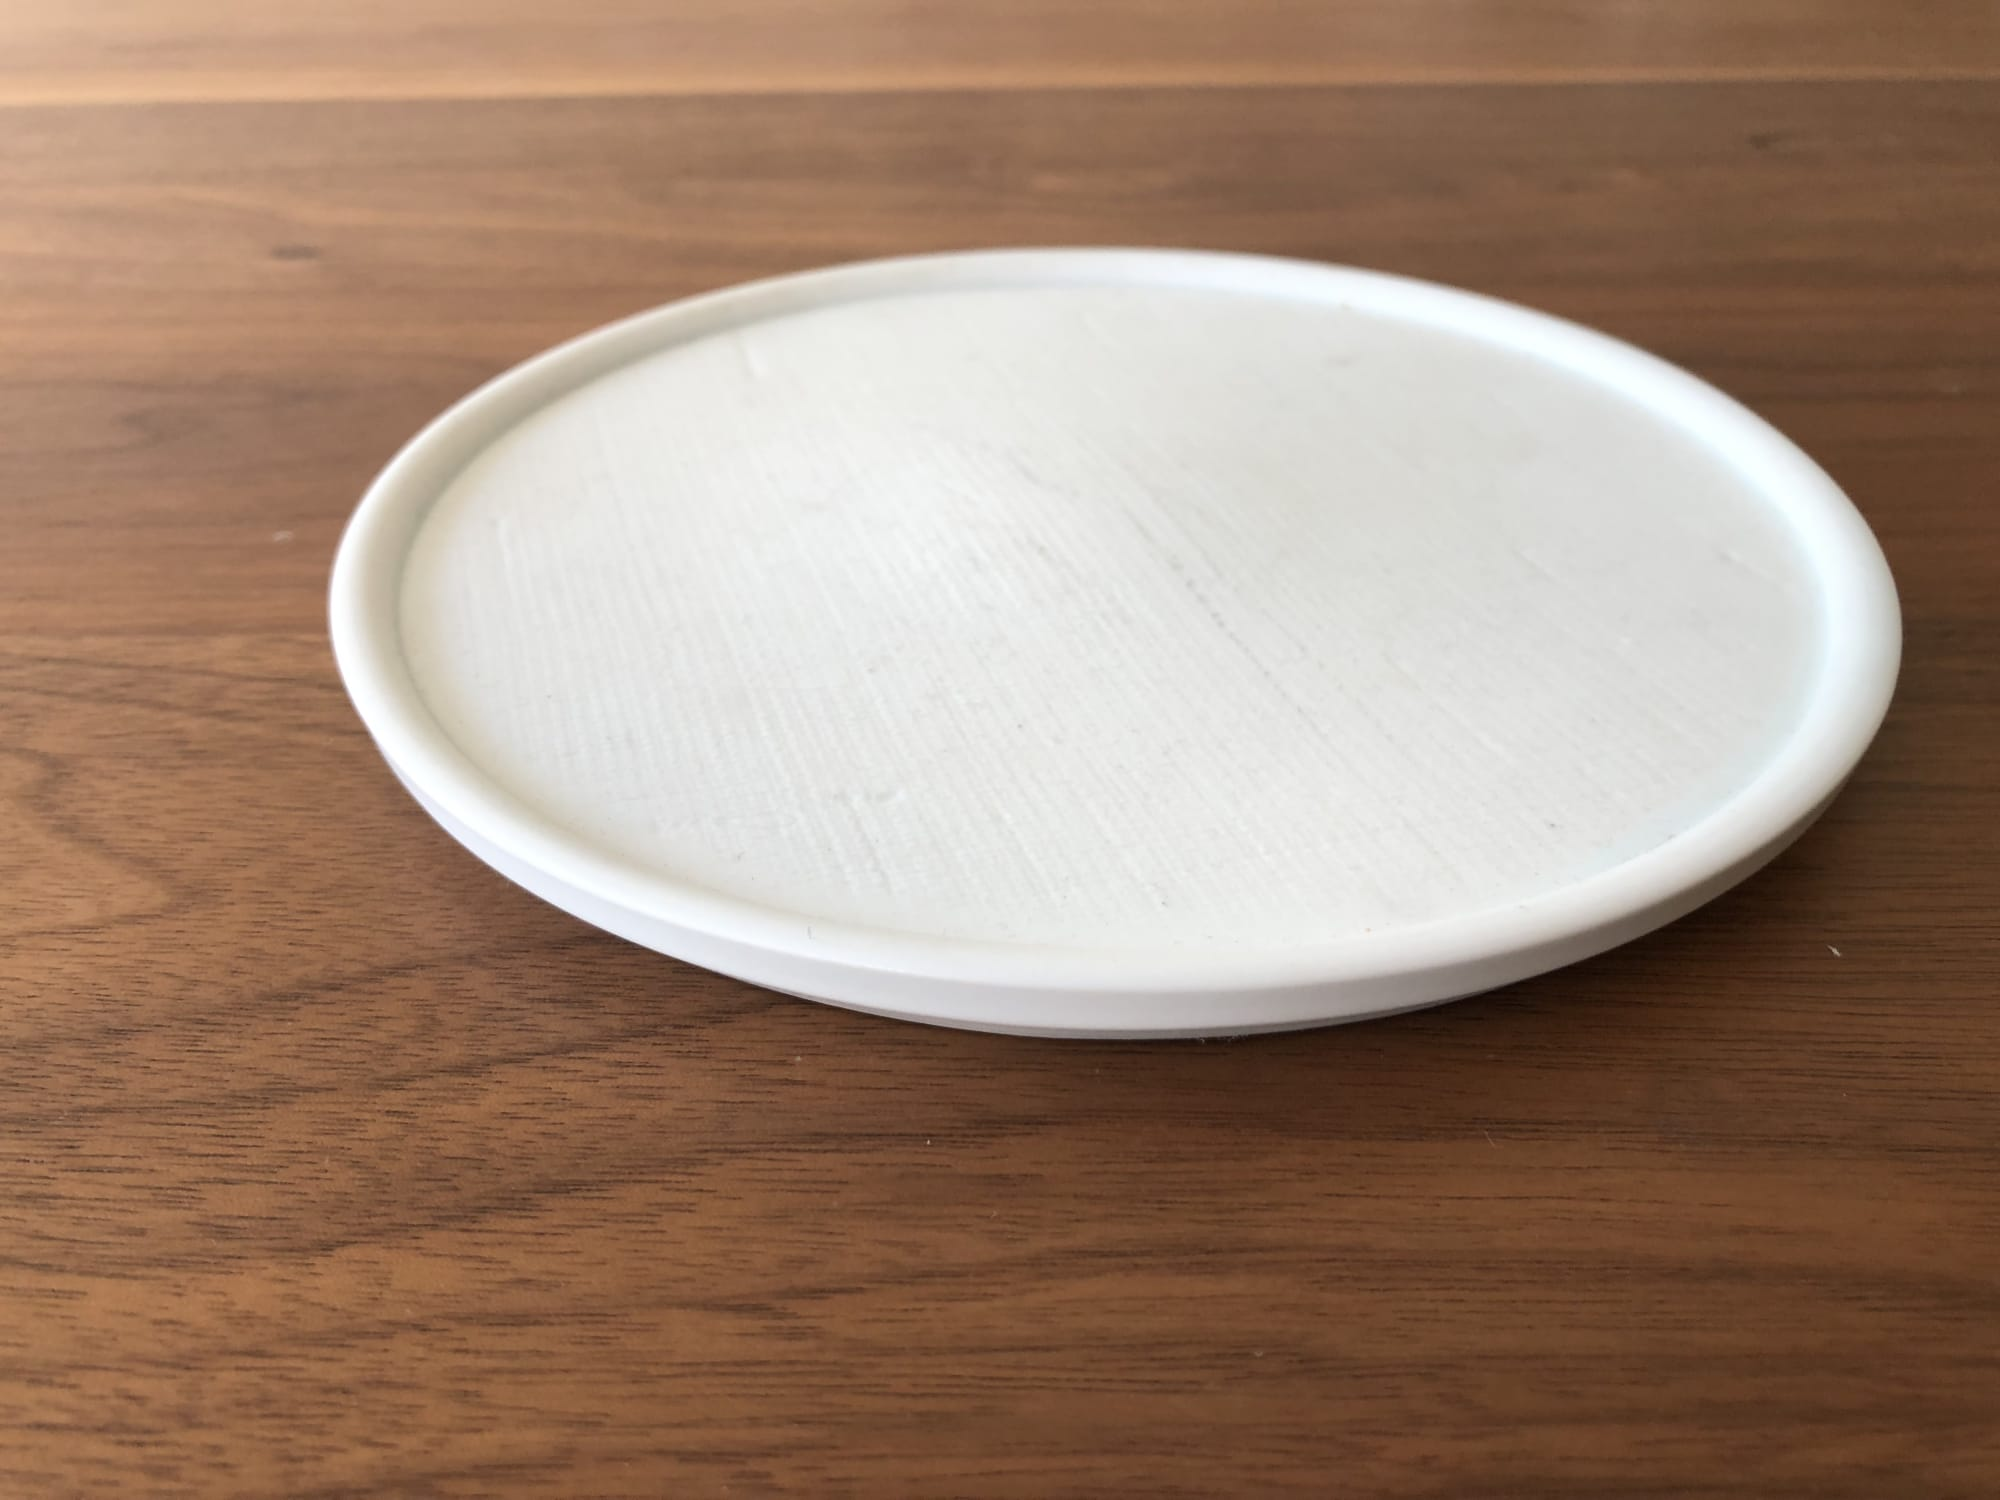 Ceramic Plates by Kwangjuyo seen at Birdsong, San Francisco - Custom Ceramic Suite